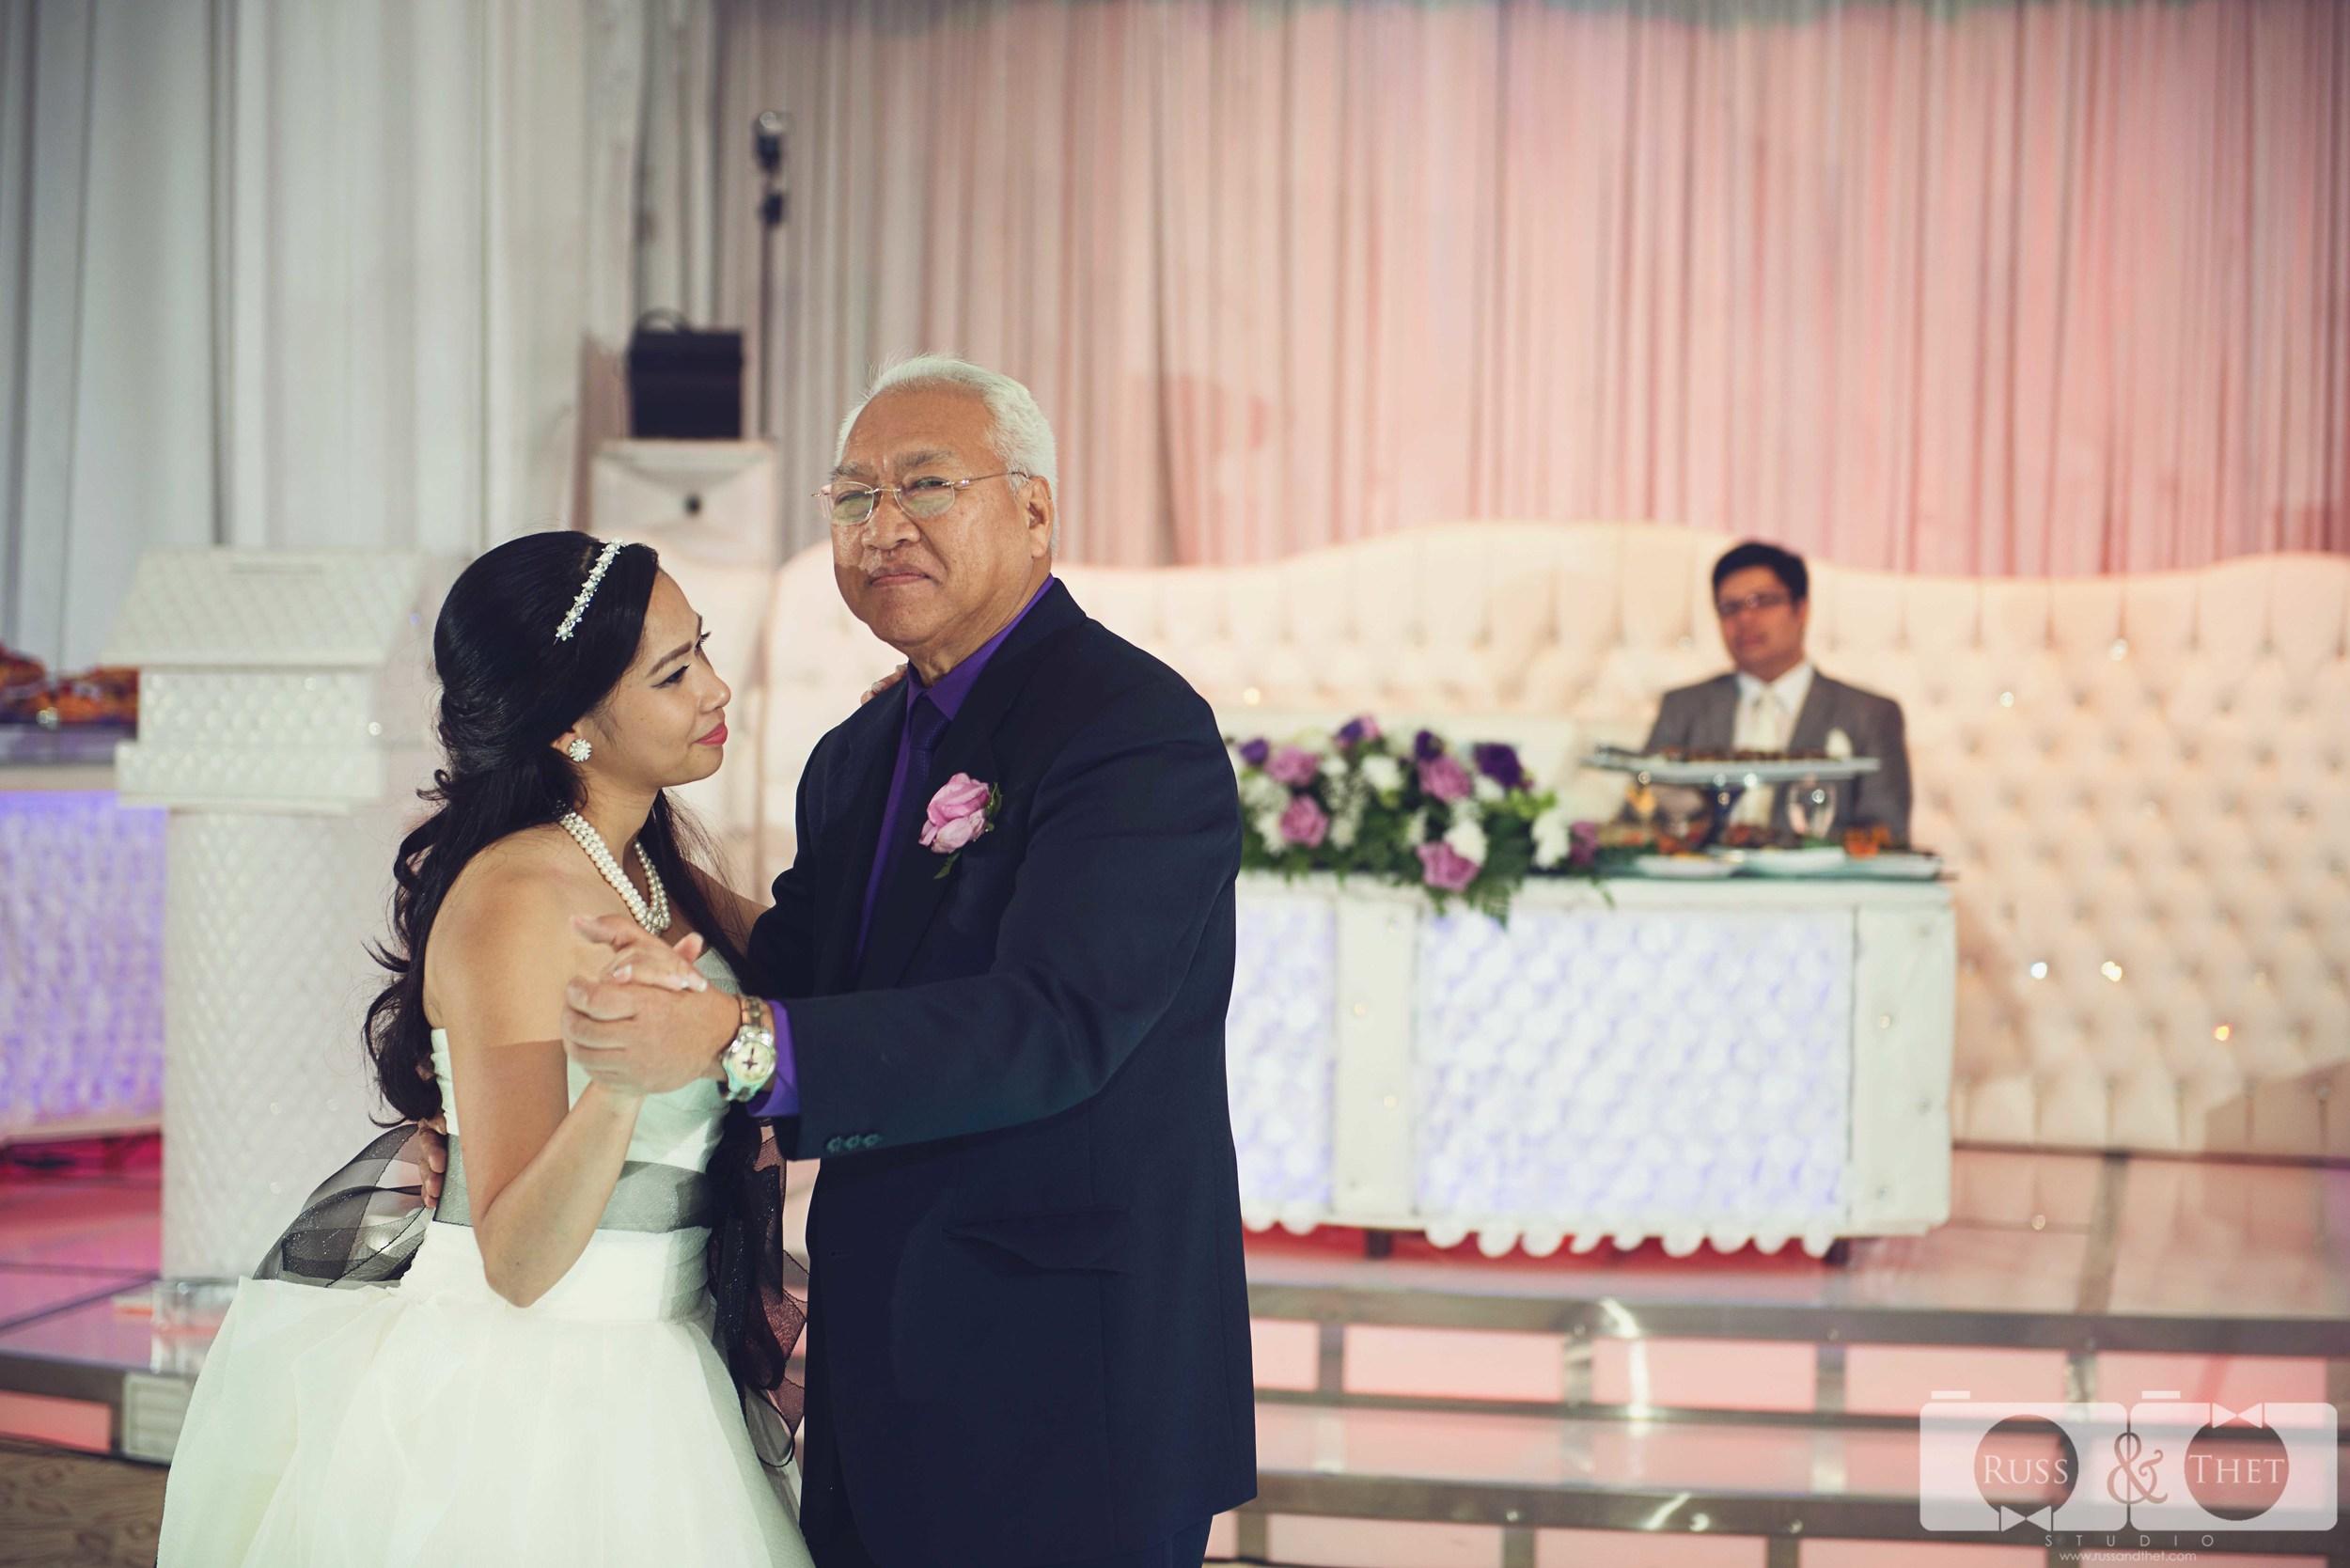 royal-palace-banquet-hall-glendale-wedding-61.JPG